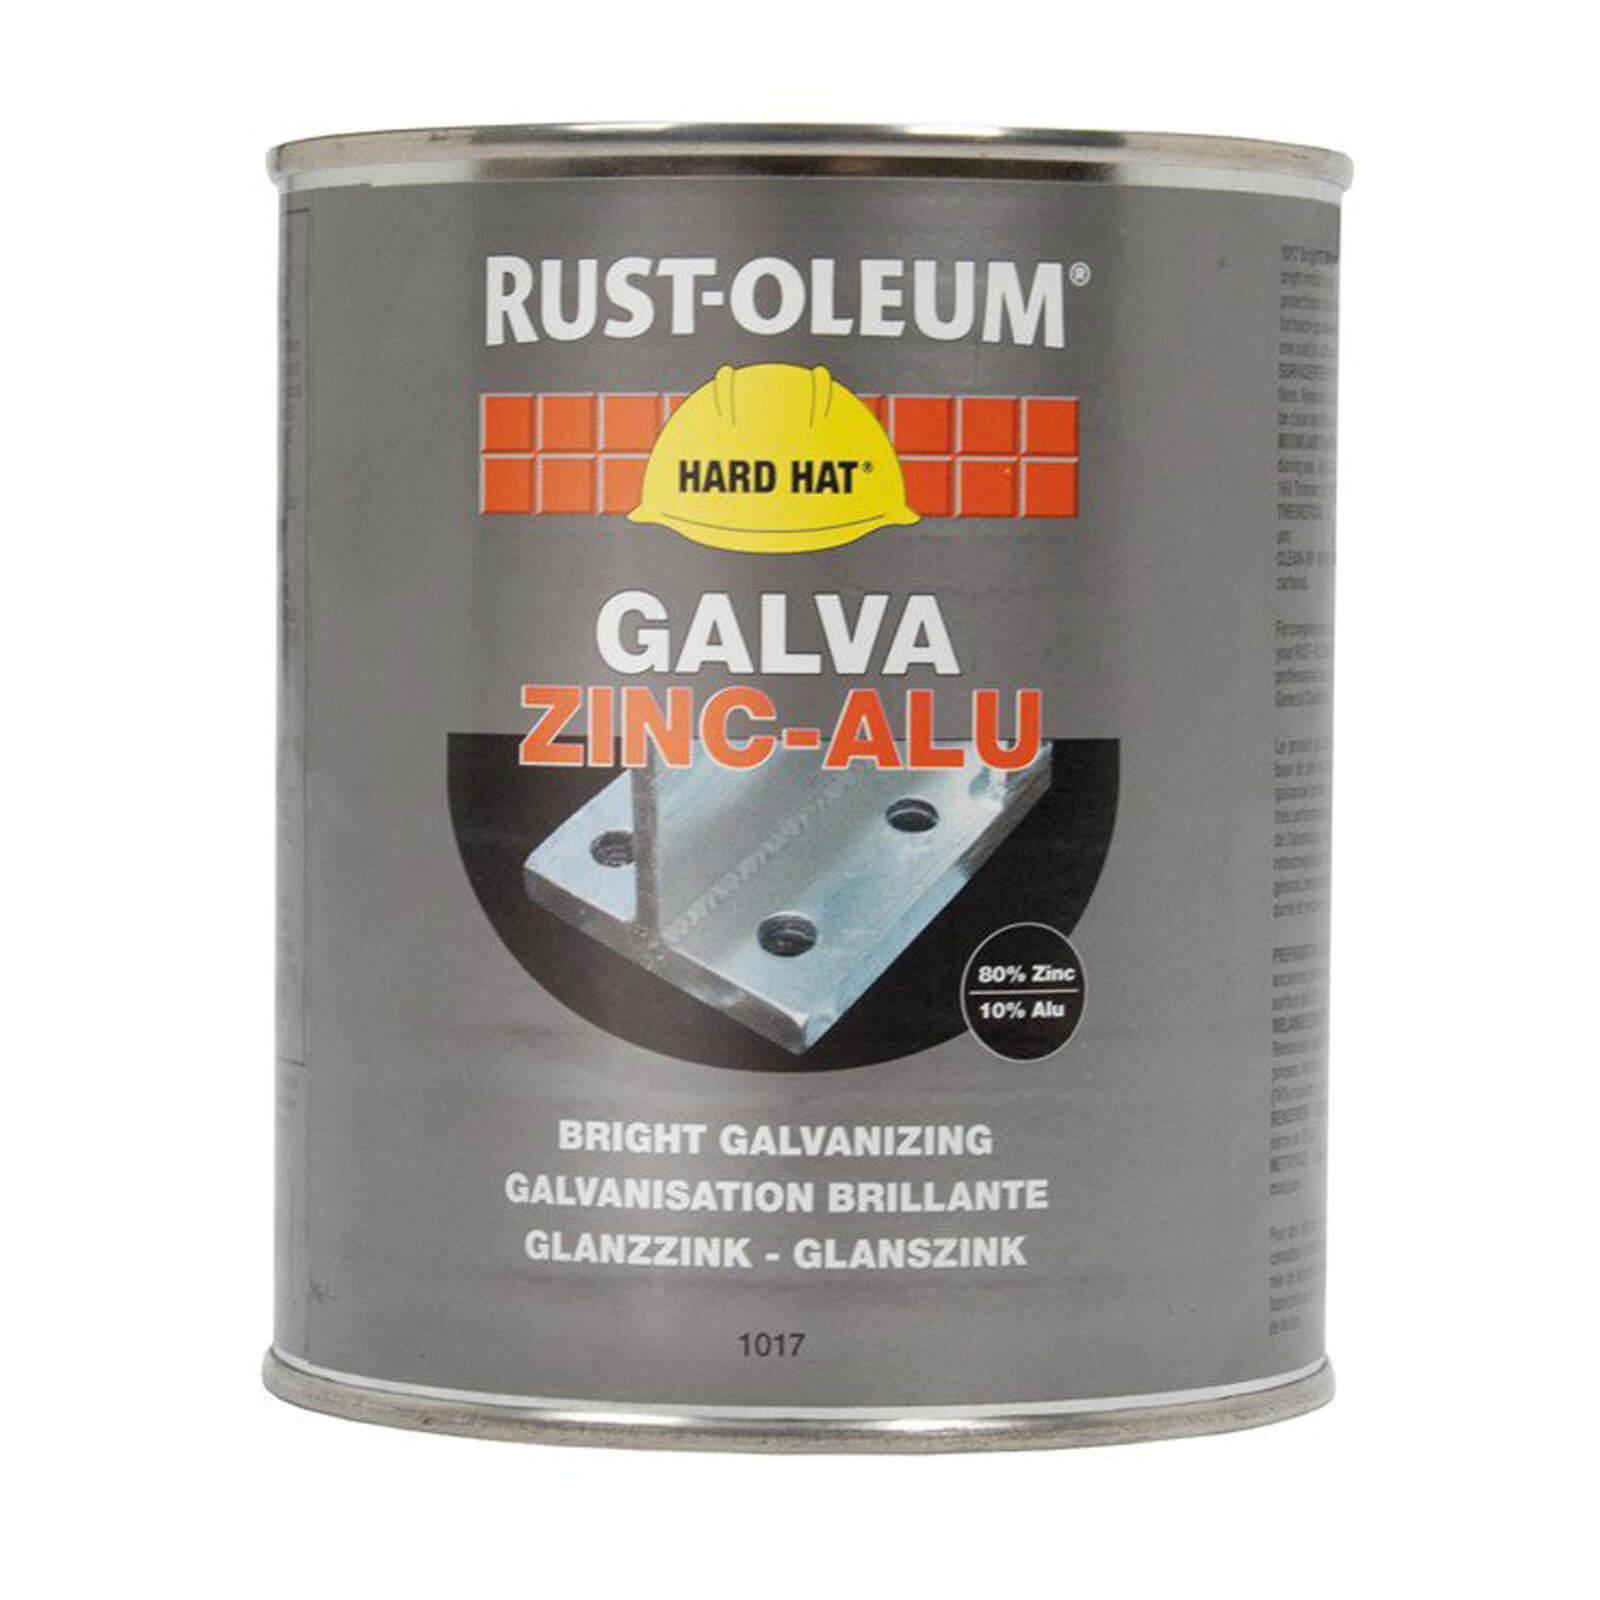 Image of Rust Oleum 1017 Galvanising Zinc Metal Paint 1kg